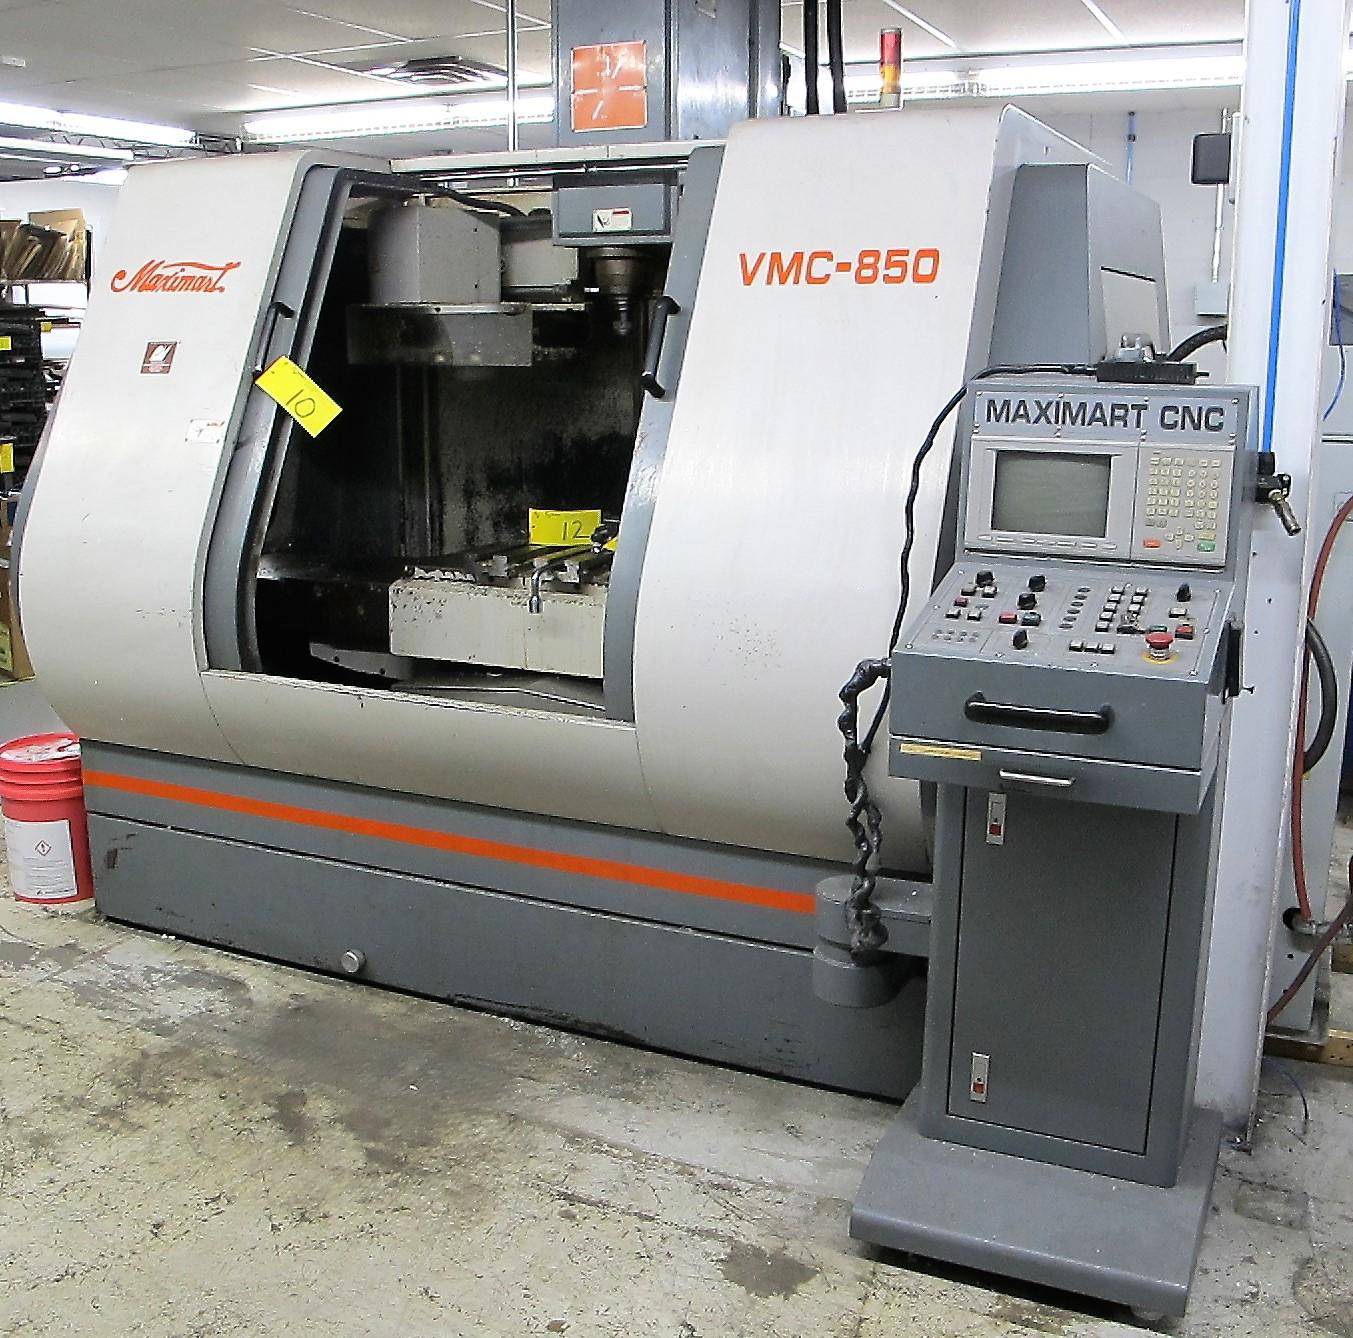 "MAXIMART VMC-850 CNC VERTICAL MACHINING CENTER, 20-ATC, MITSUBISHI CONTROL, 18"" X 39"" TABLE, 3"""